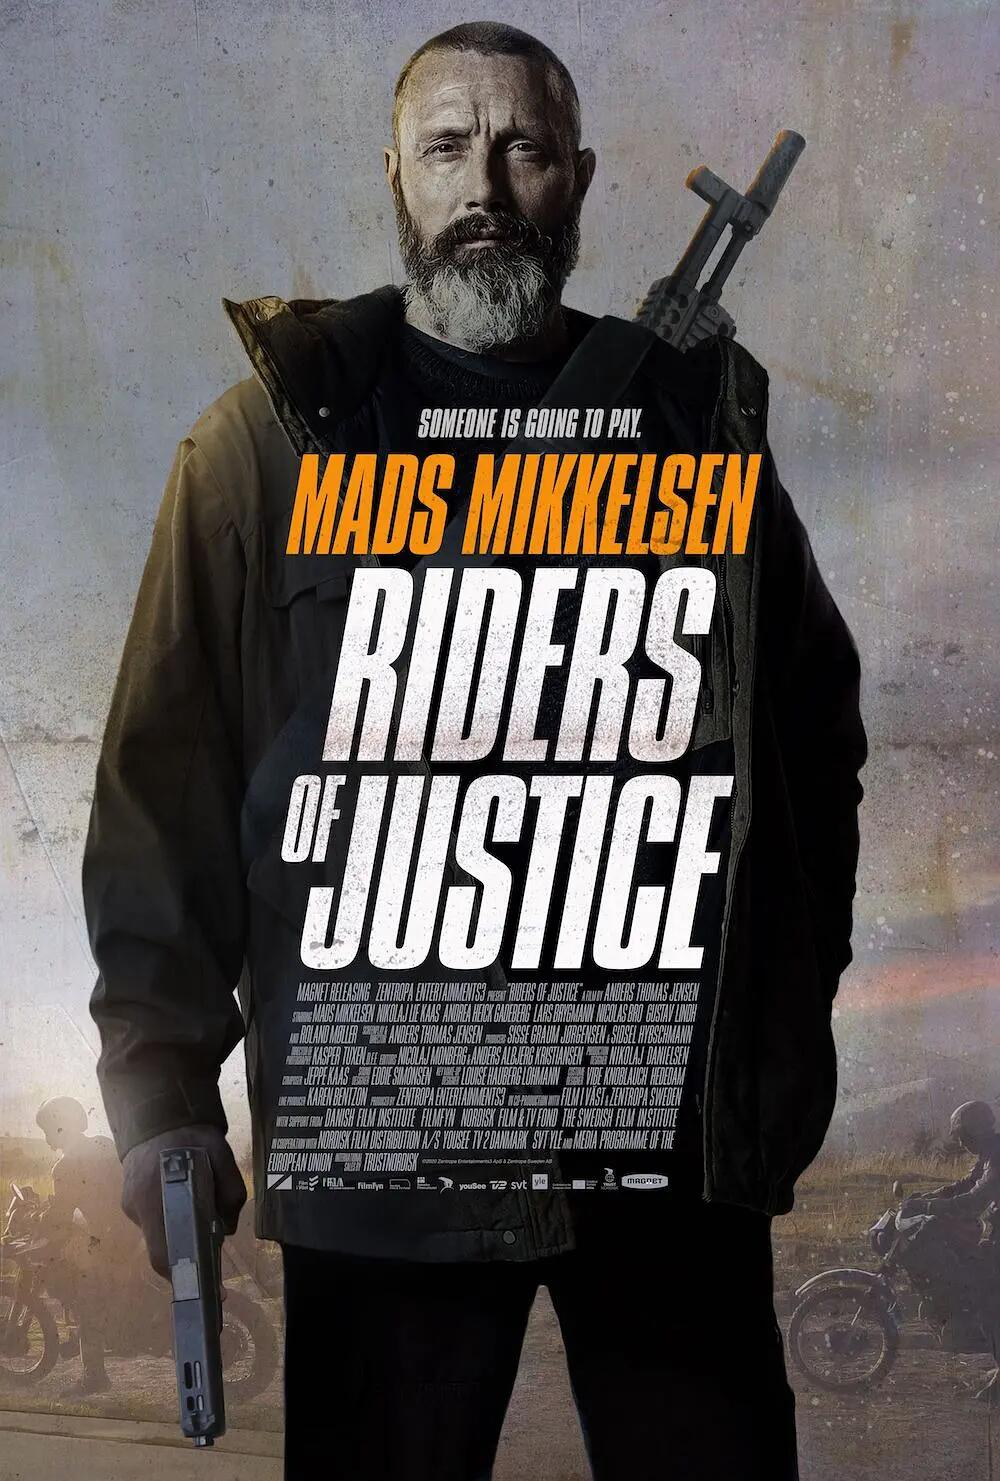 <strong>电影</strong>推荐 正义骑士 豆瓣观看